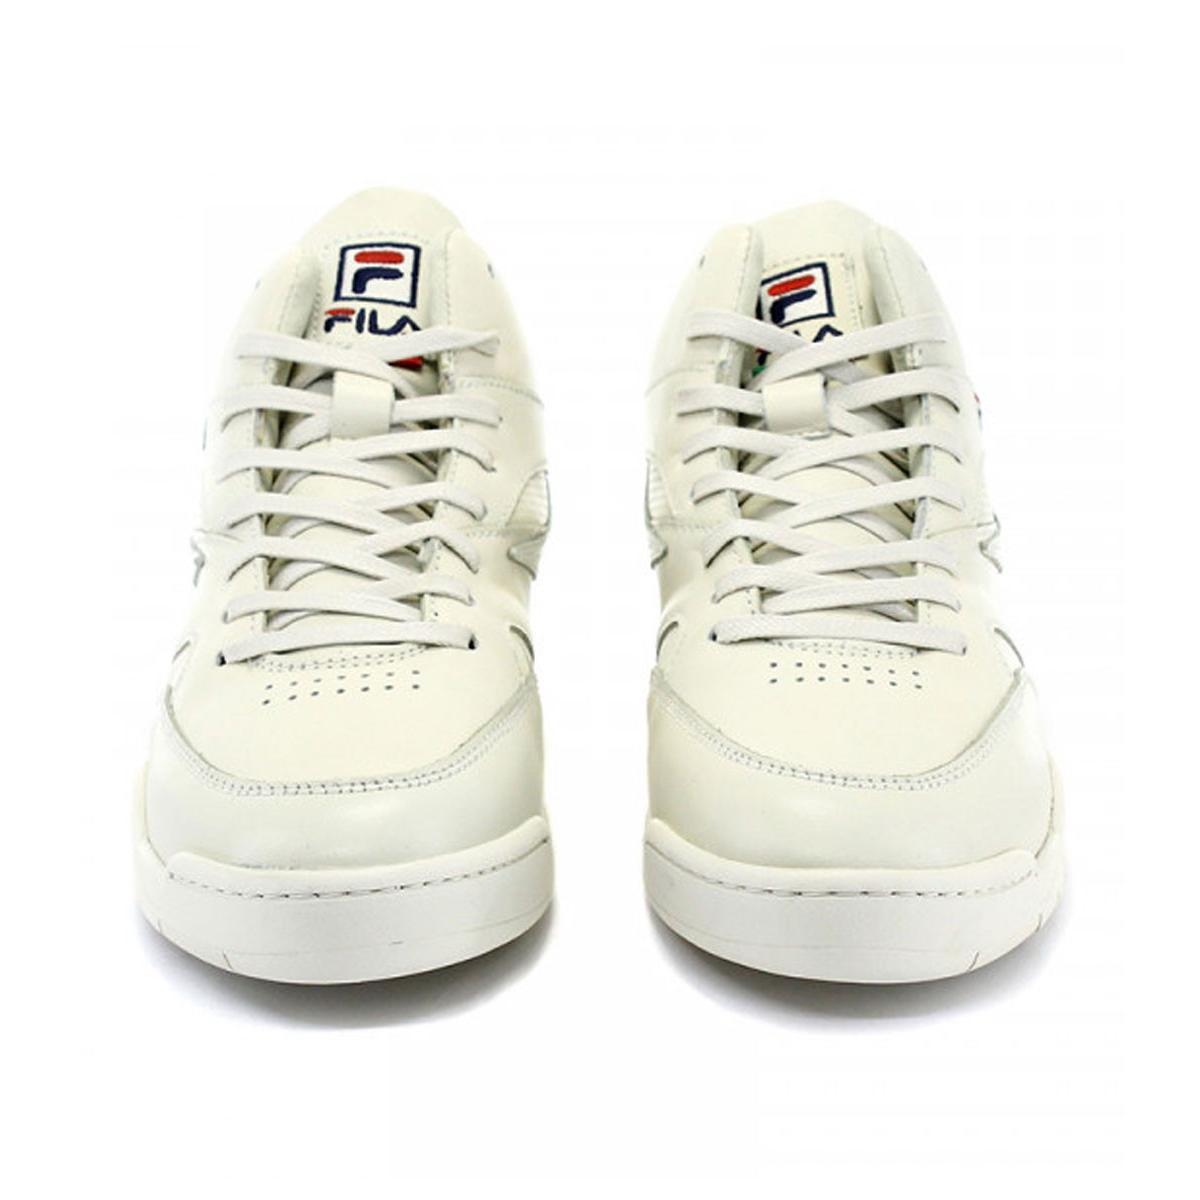 Scarpe Sneakers FILA PINE MID da uomo rif. 1010517.79G